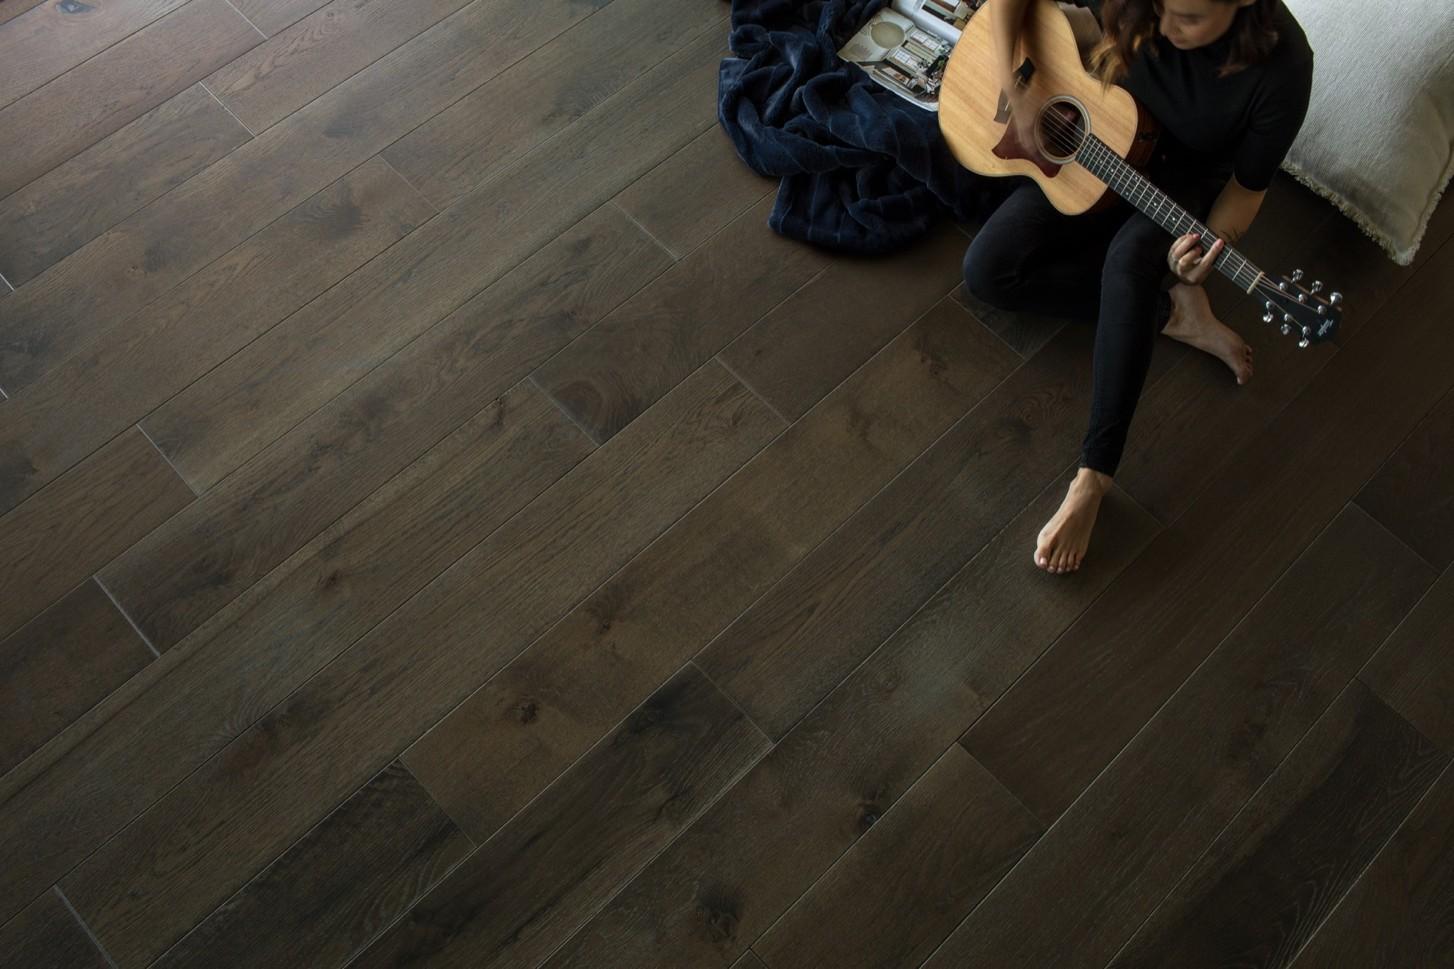 Anderson tuftex hardwood | Messina's Flooring flooring